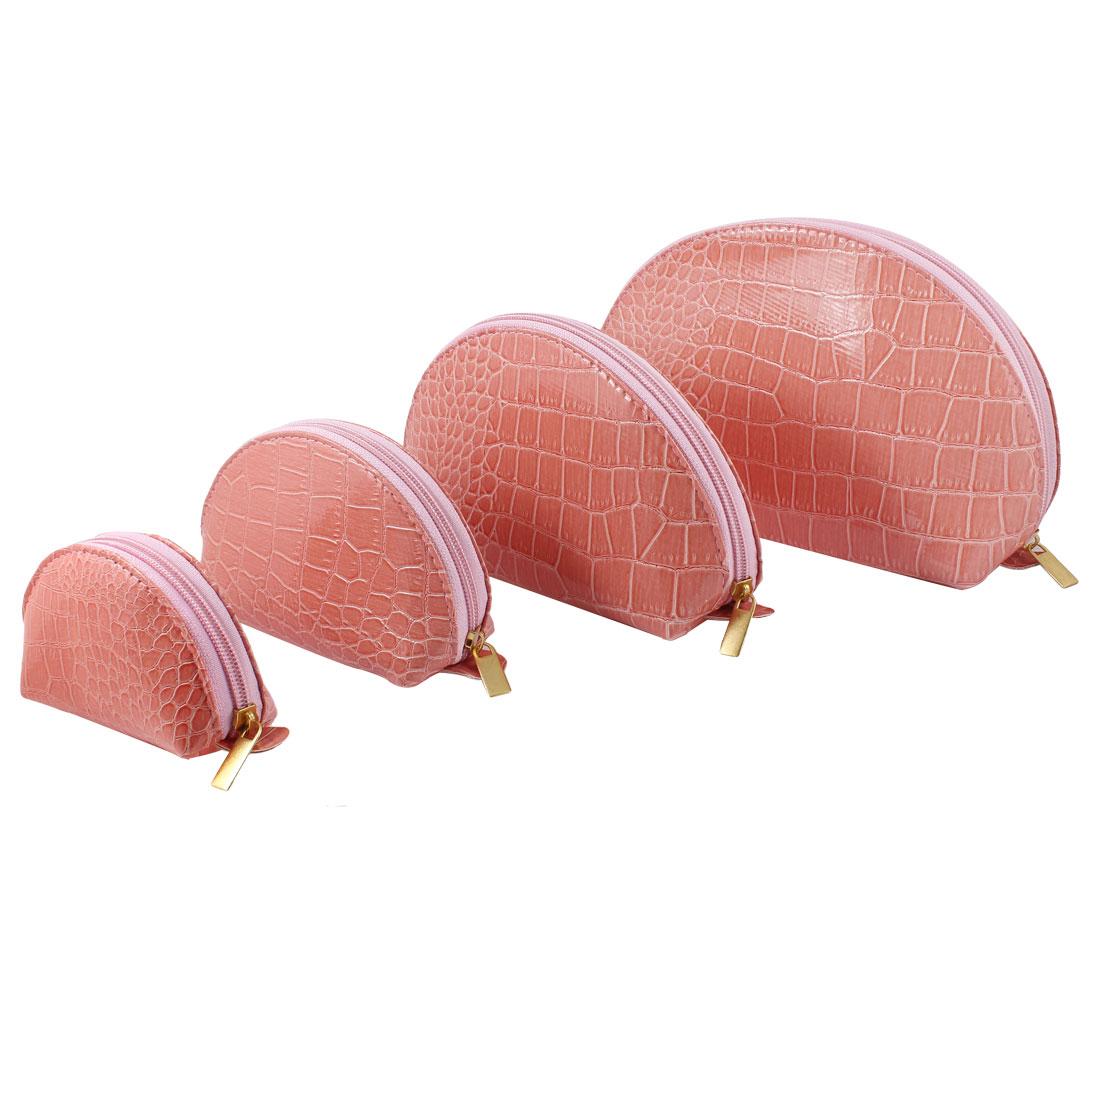 Lady Nylon Lining Zipper Closure Pink Crocodile Print Cosmetic Bag 4 in 1